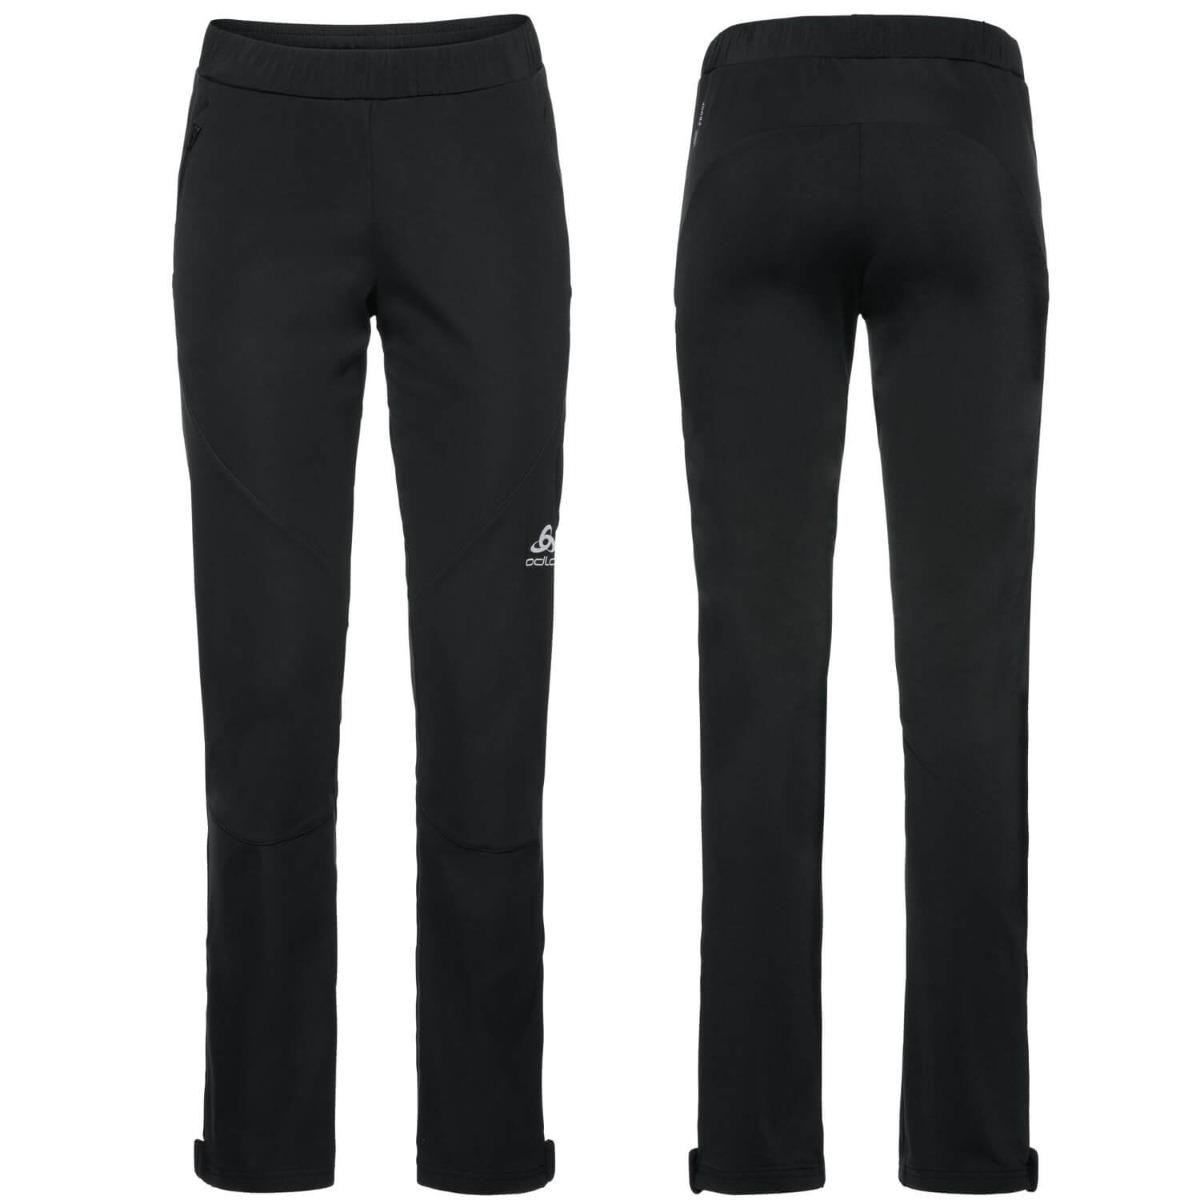 622231 Odlo black Pants AEOLUS ELEMENT WARM